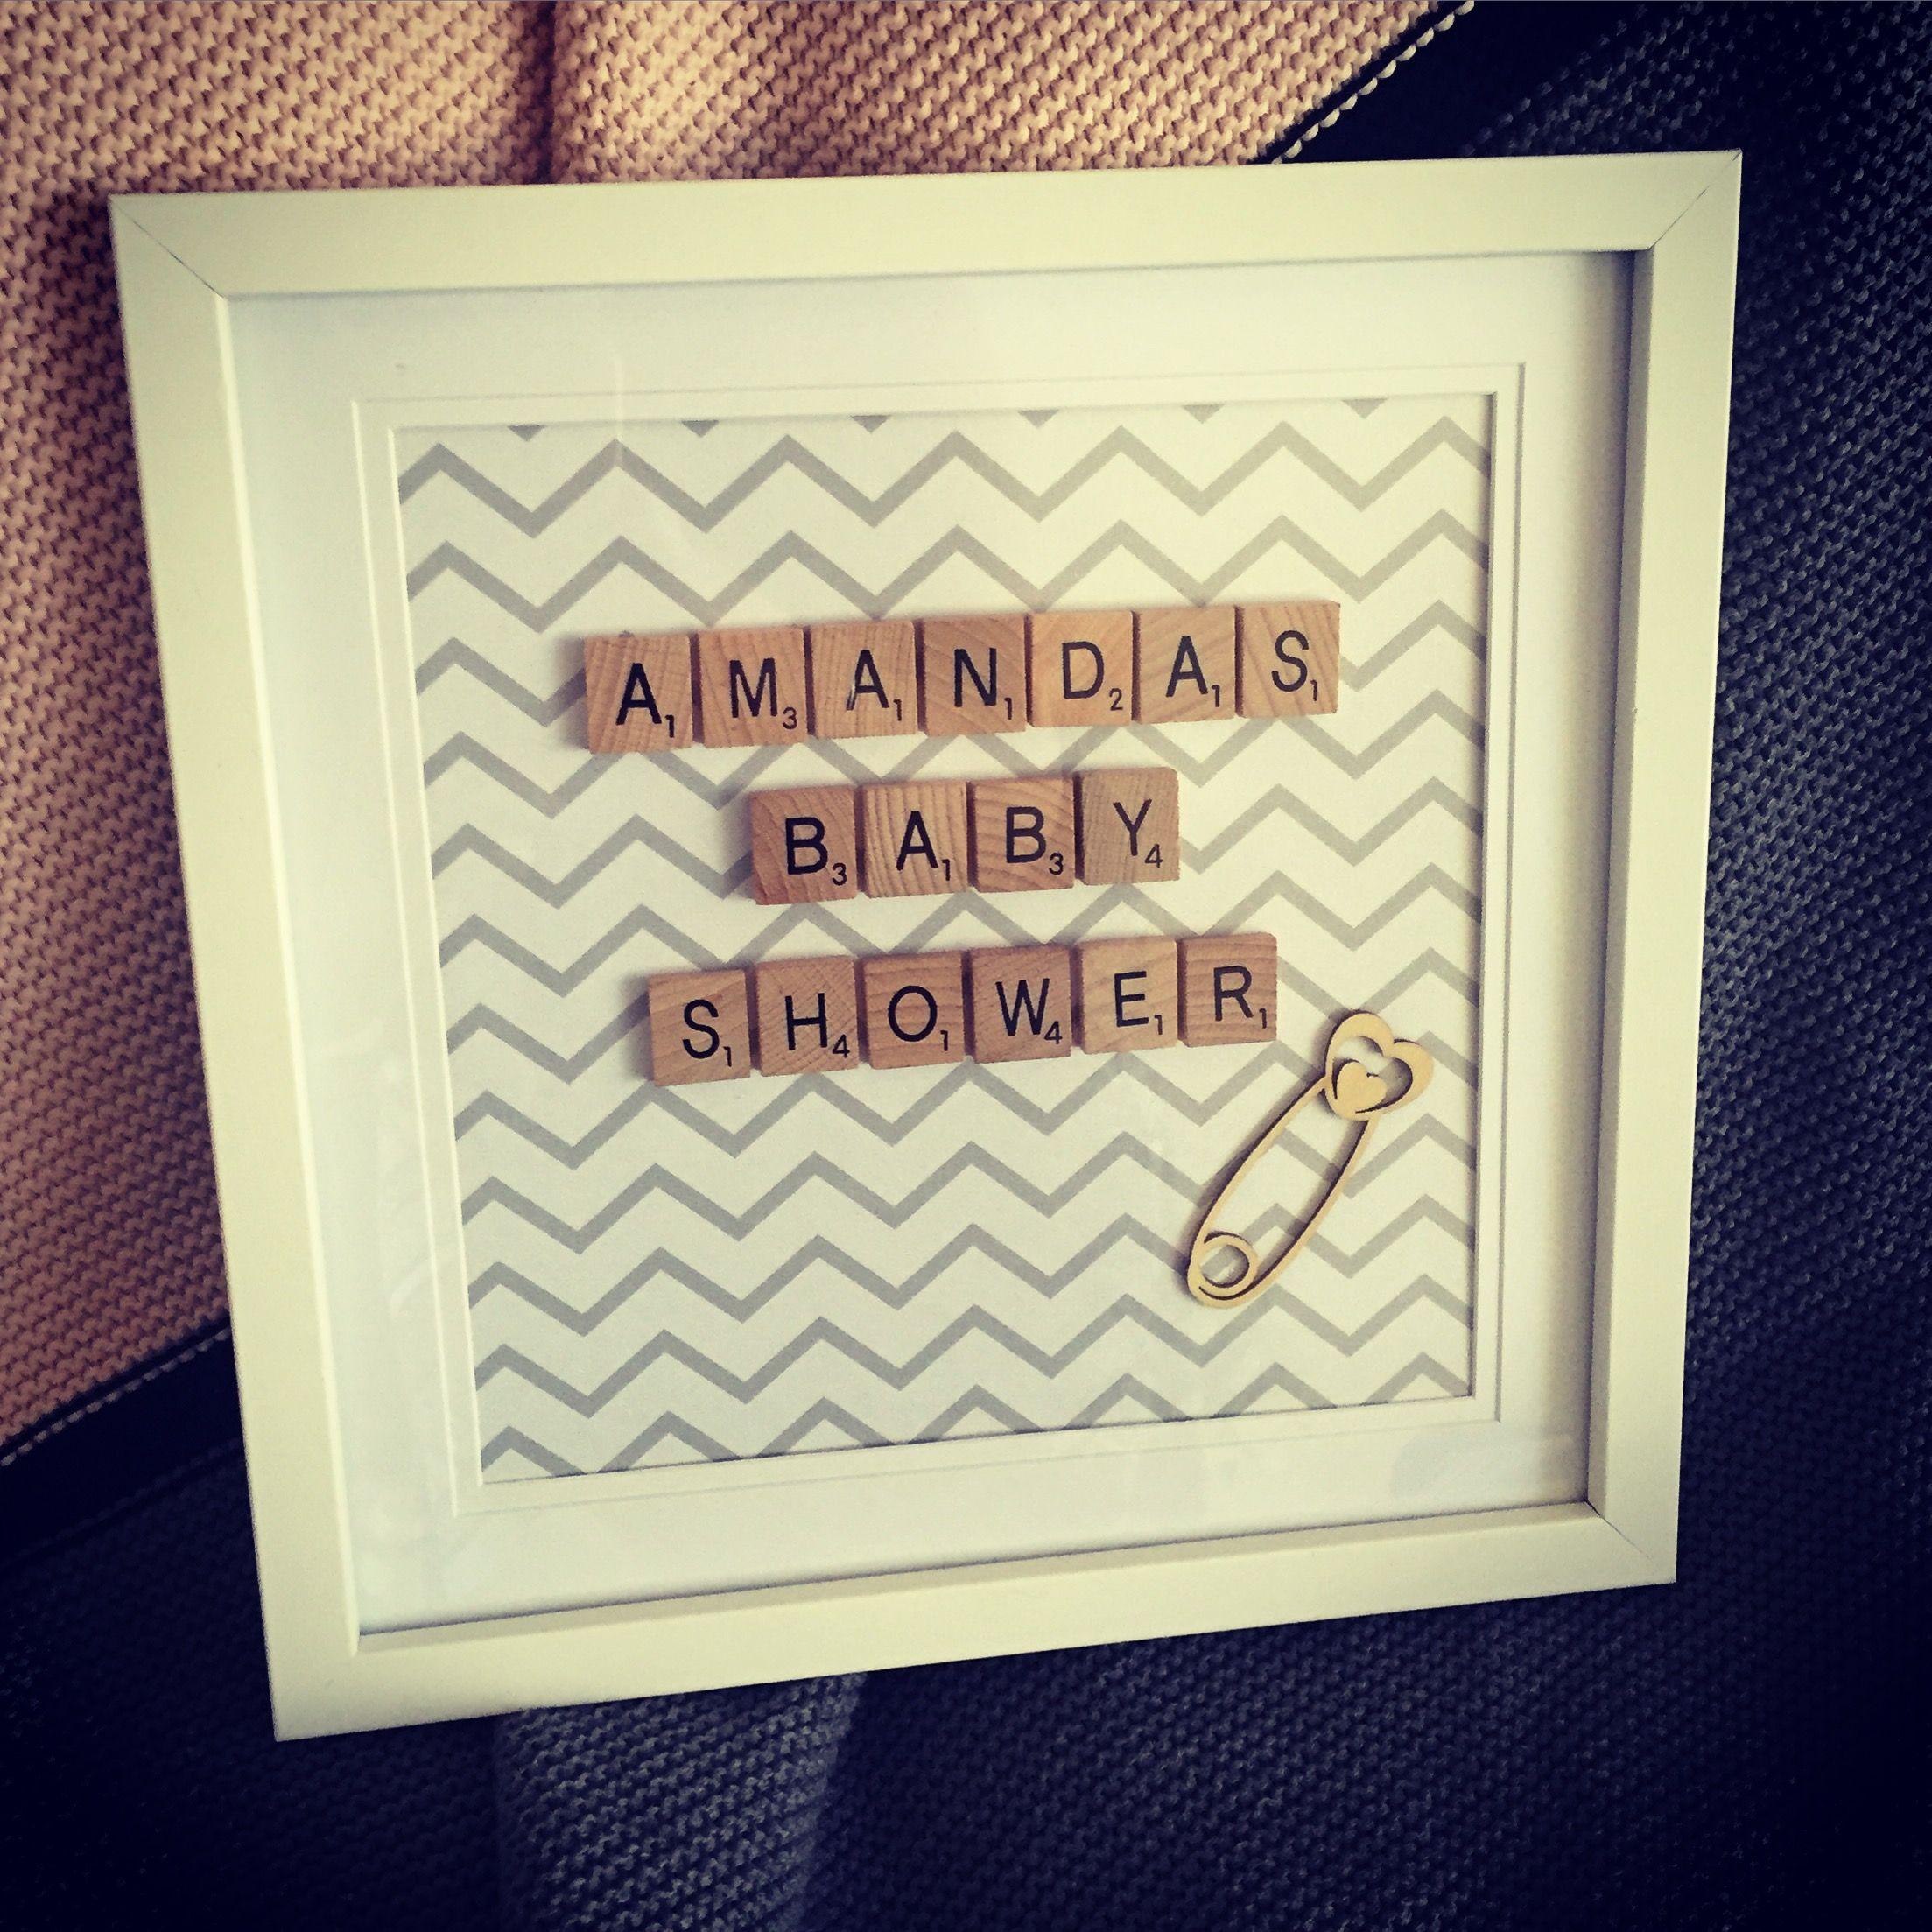 Baby Shower Frame Gift Idea, Baby Shower, Grey Chevron , Scrabble ...